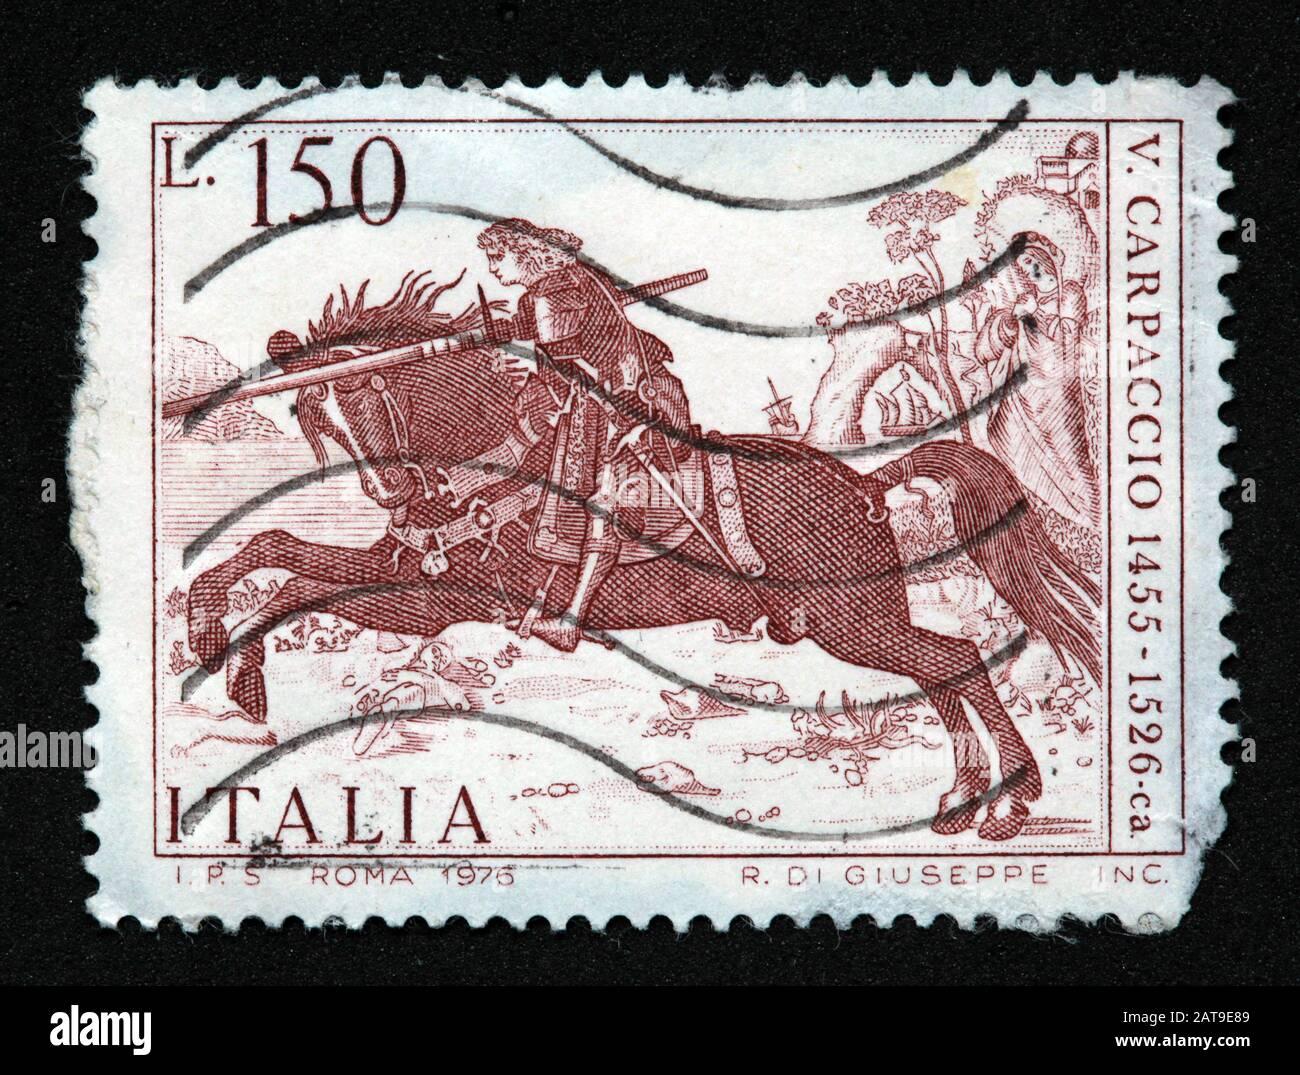 Dieses Stockfoto: Italienische Briefmarke, poste Italia verwendet und gestempelt, Roma, 1976 R.Di.Giuseppe Inc, 150Lire, 150L, V.Carpaccio, 1455-1526 Carpaccio - 2AT9E8